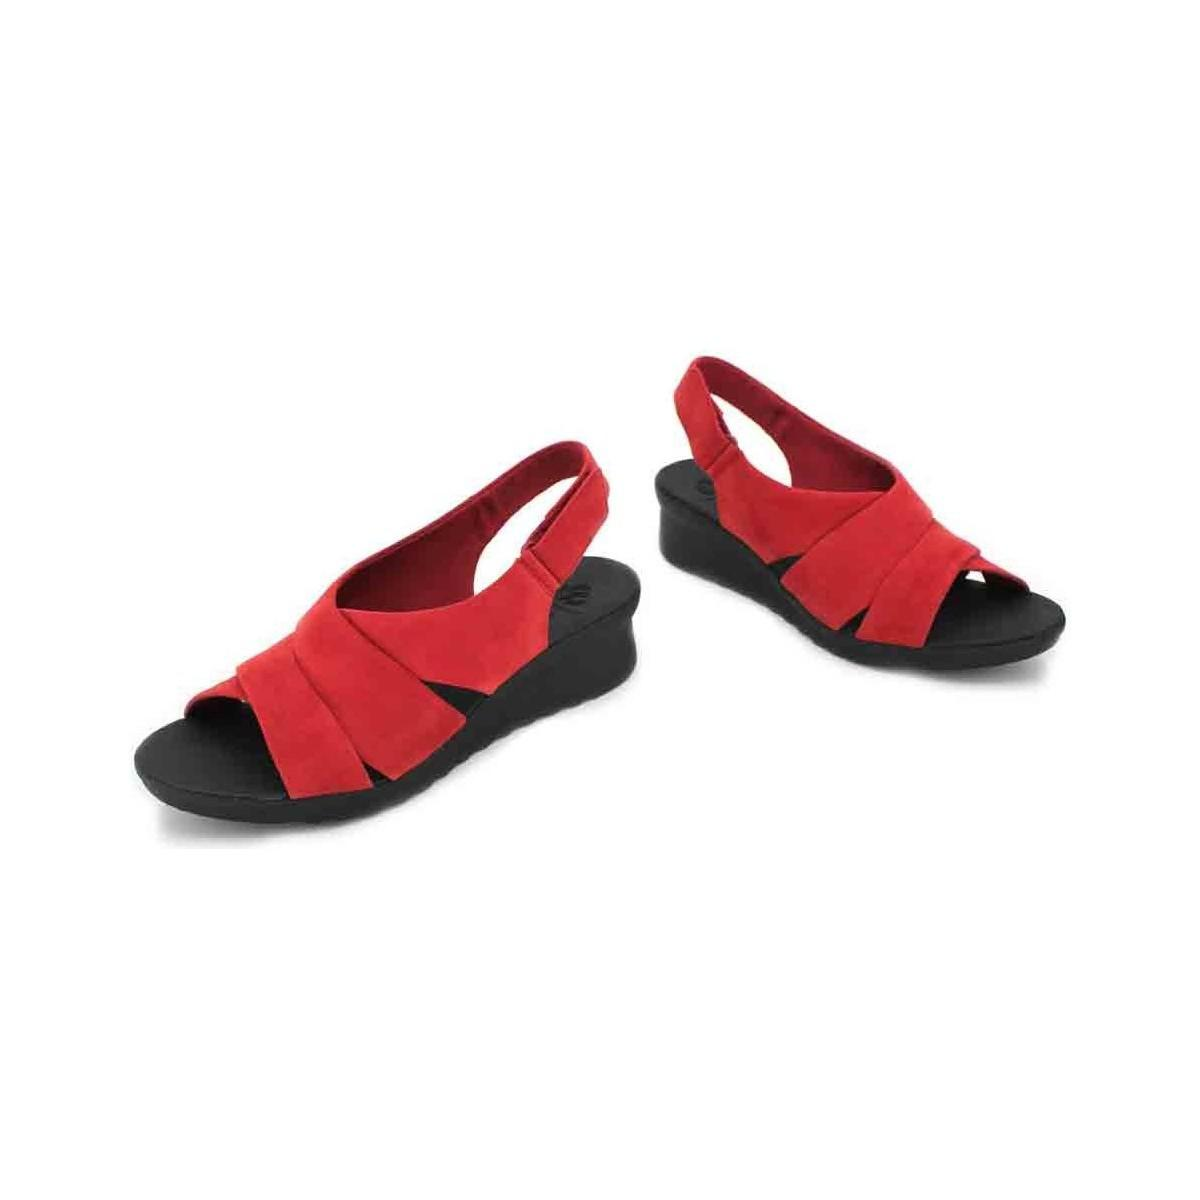 fc1bcd53a988 Clarks - Caddell Petal Women s Sandals Women s Sandals In Red - Lyst. View  fullscreen